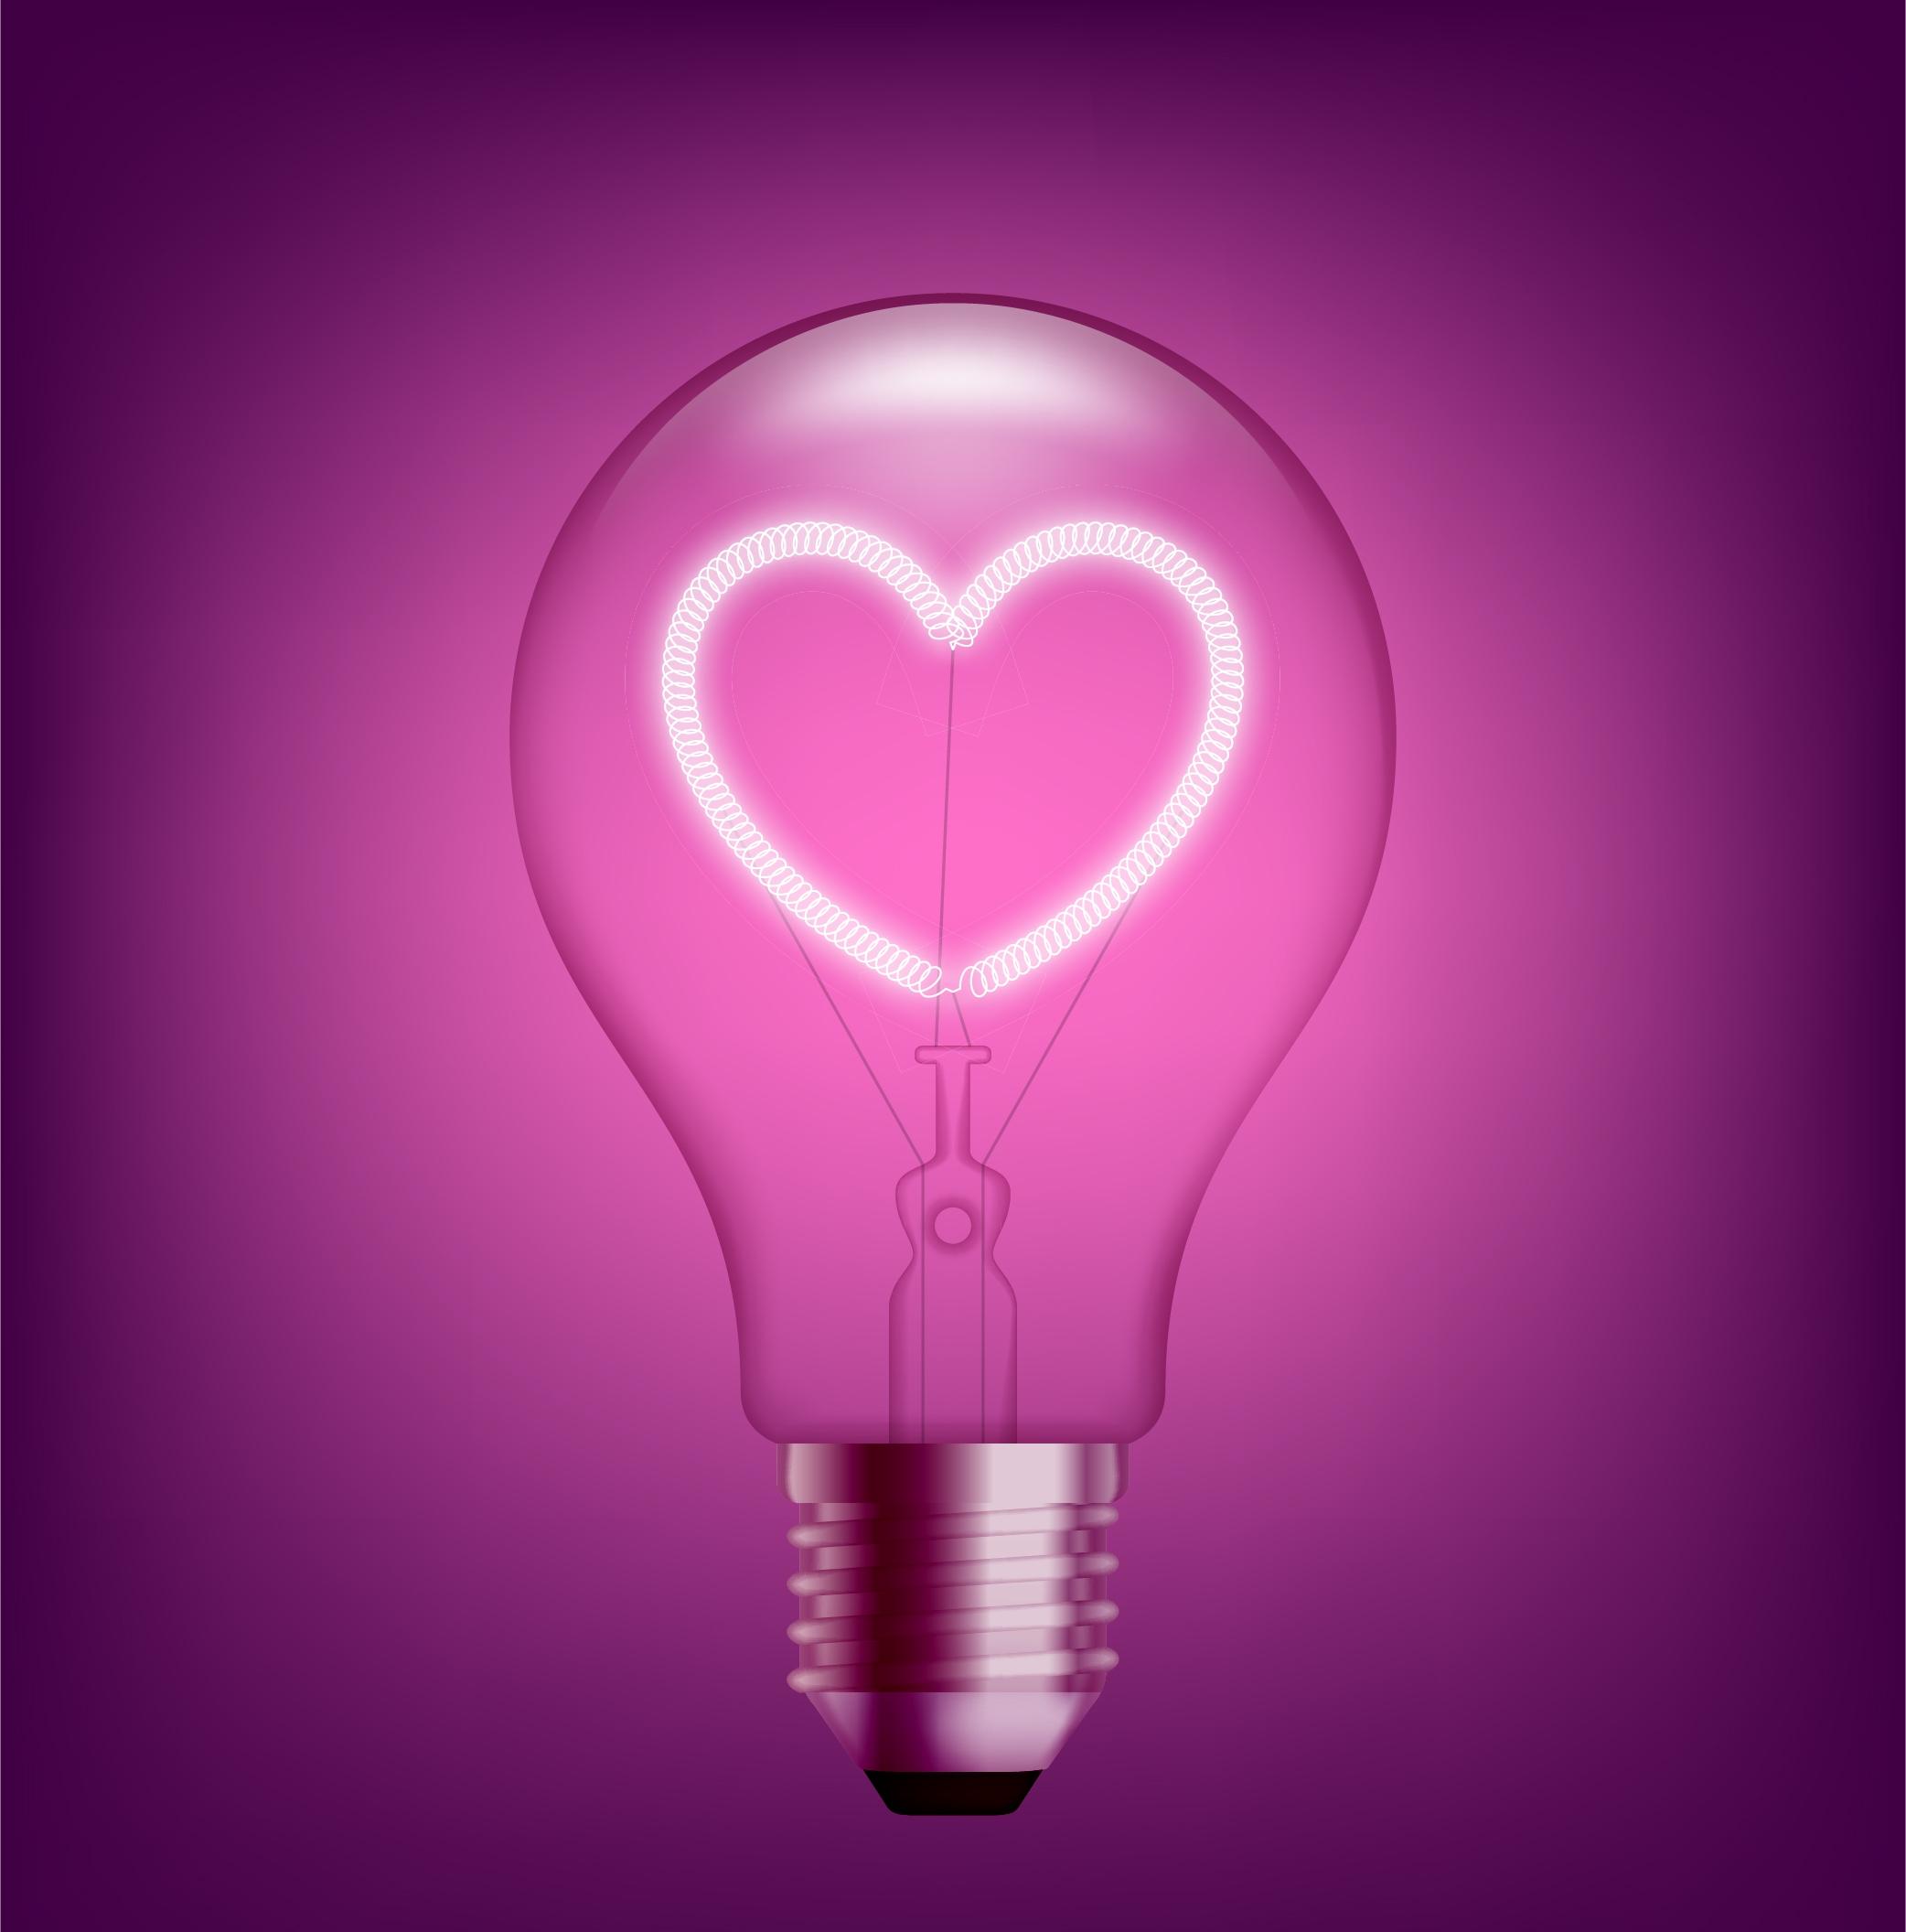 - Les bâtiments s'illuminent en rose…